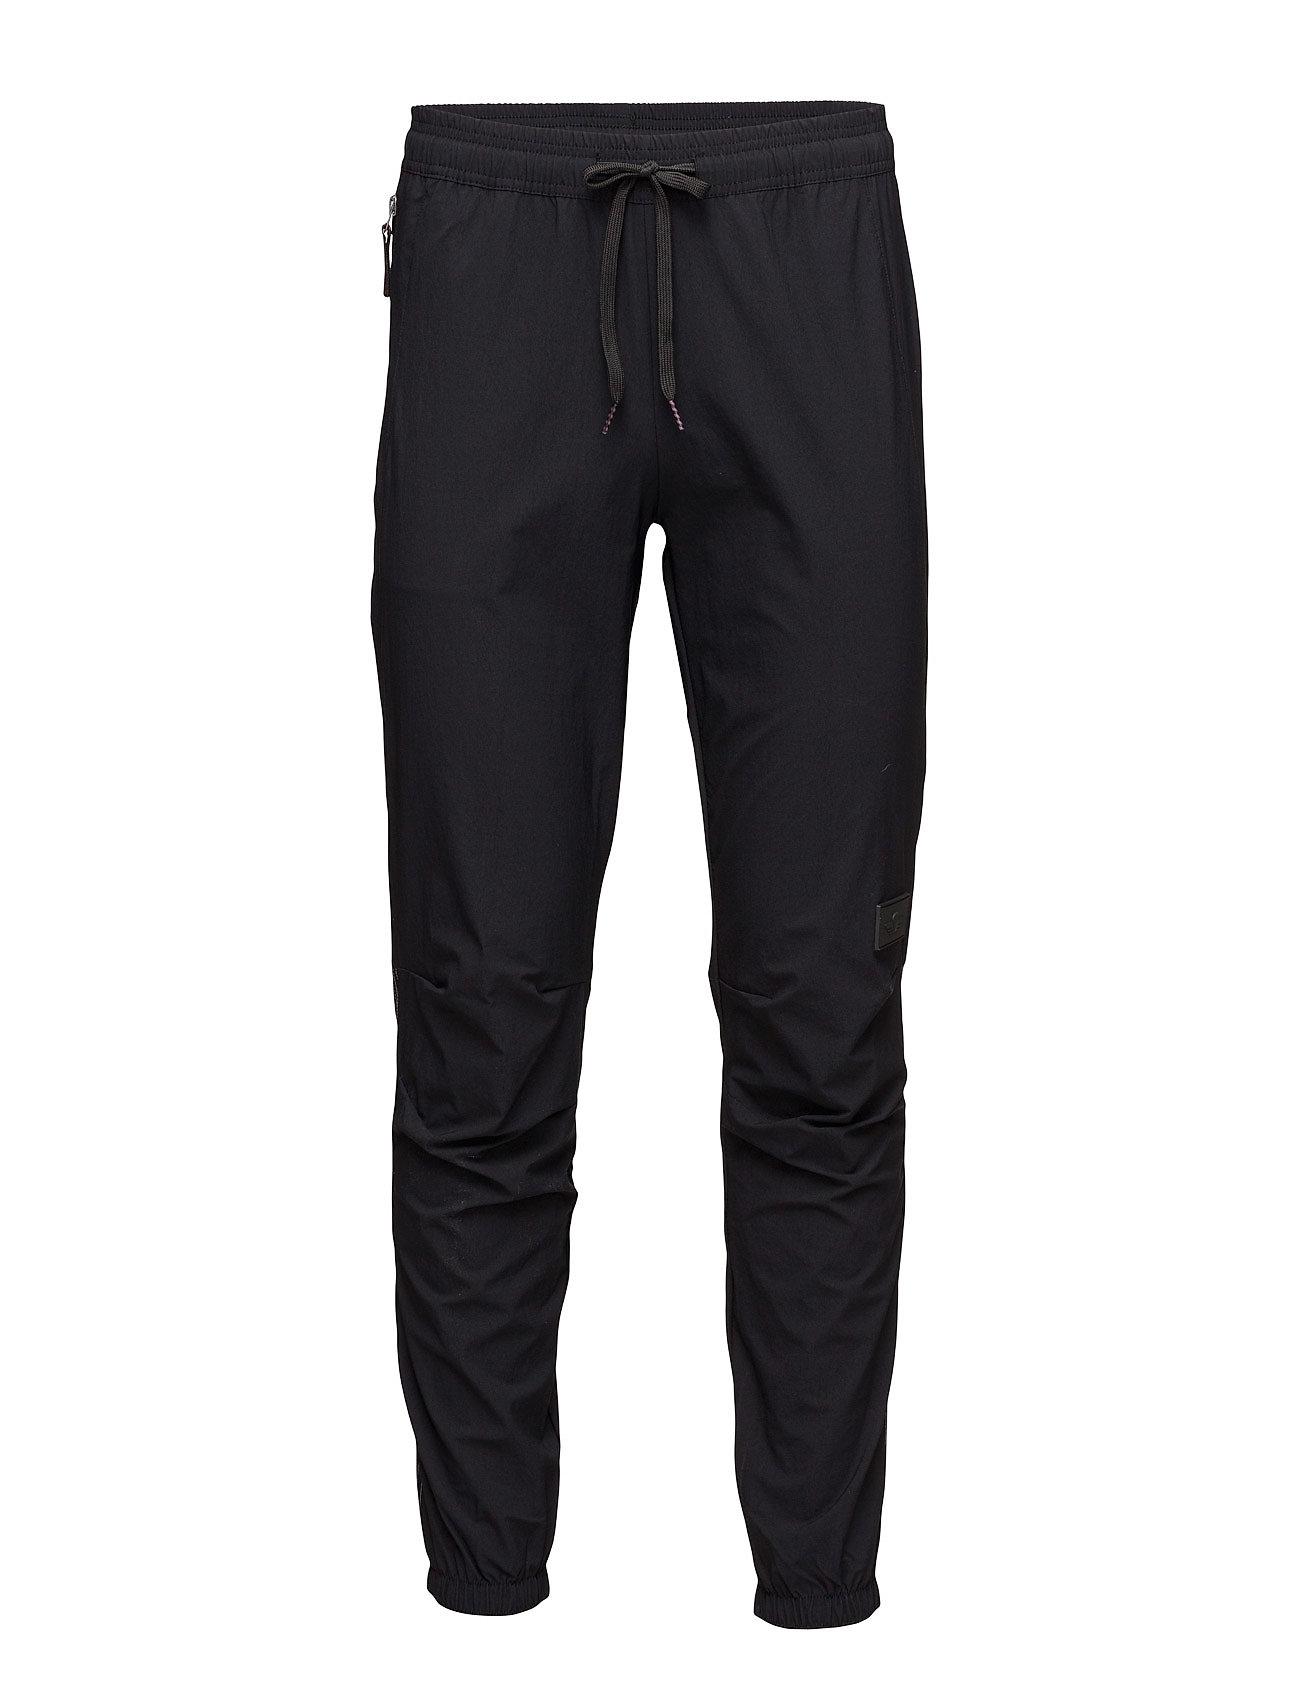 Newline svart 4 Way Stretch Drop Zone Pants Joggingbyxor